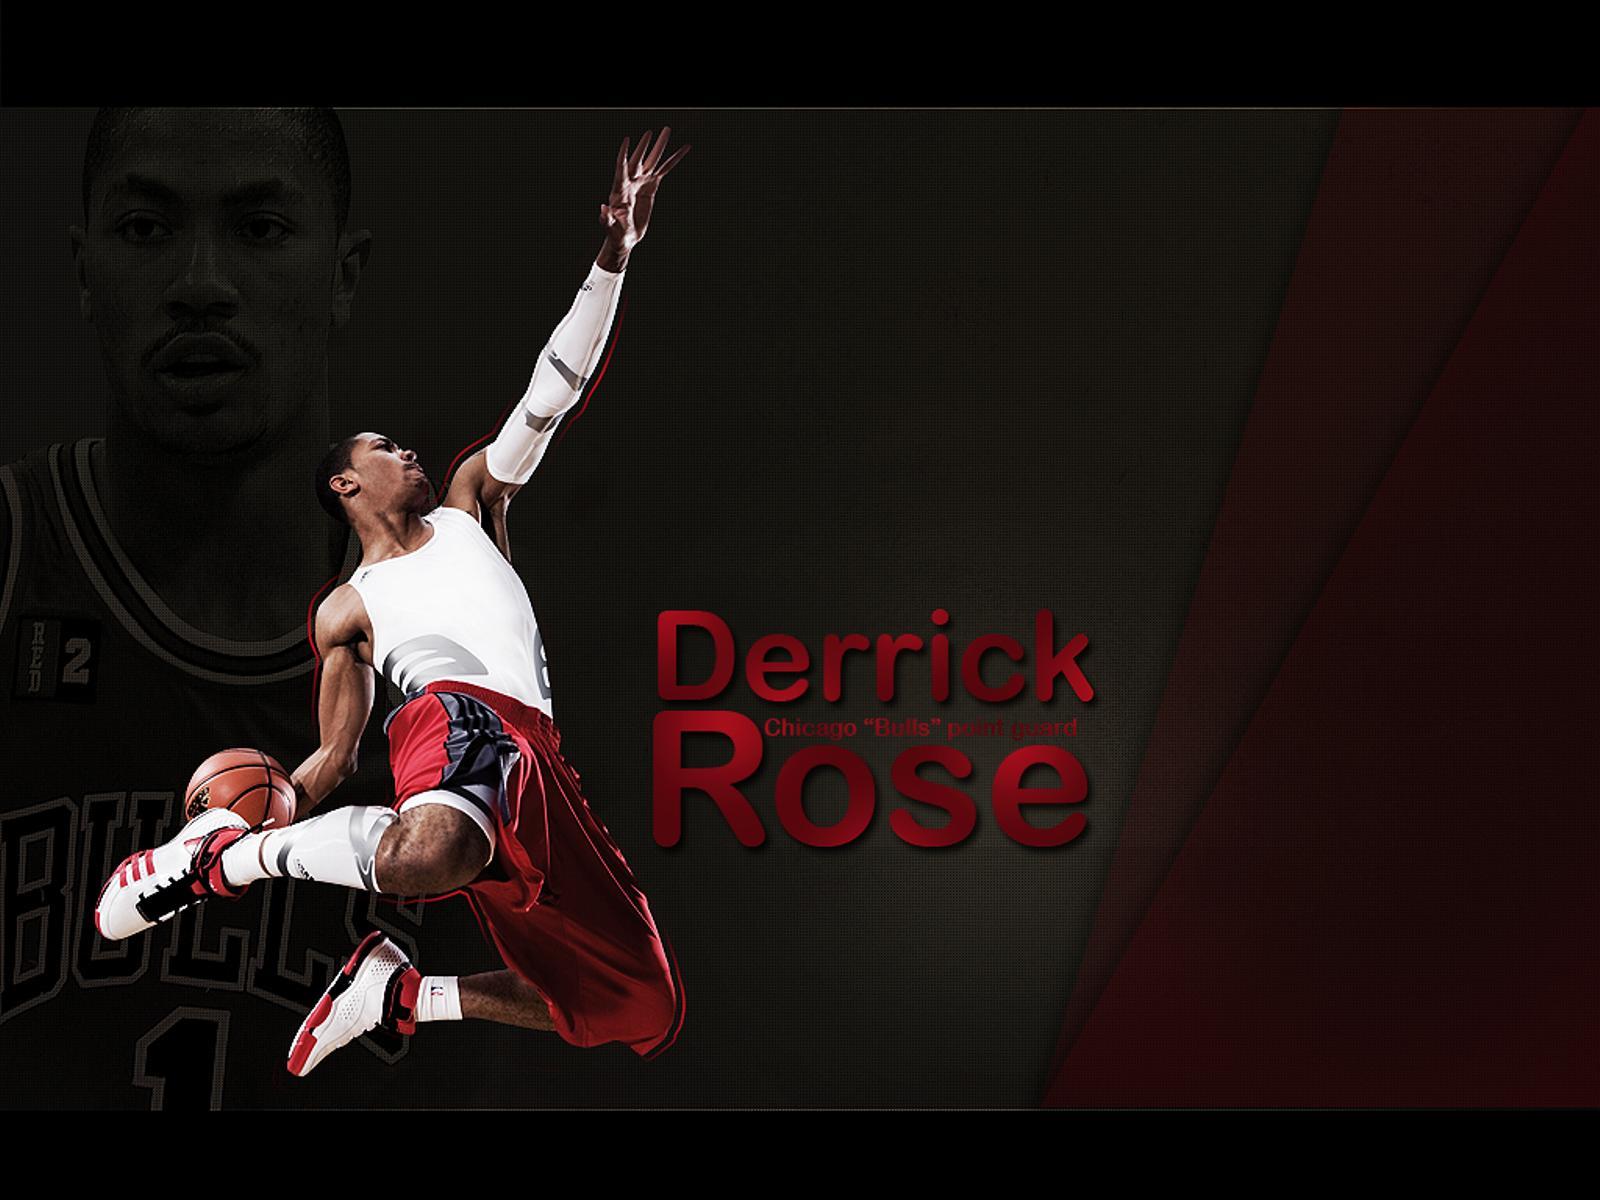 Derrick Rose Wallpapers 2015 HD - Wallpaper Cave